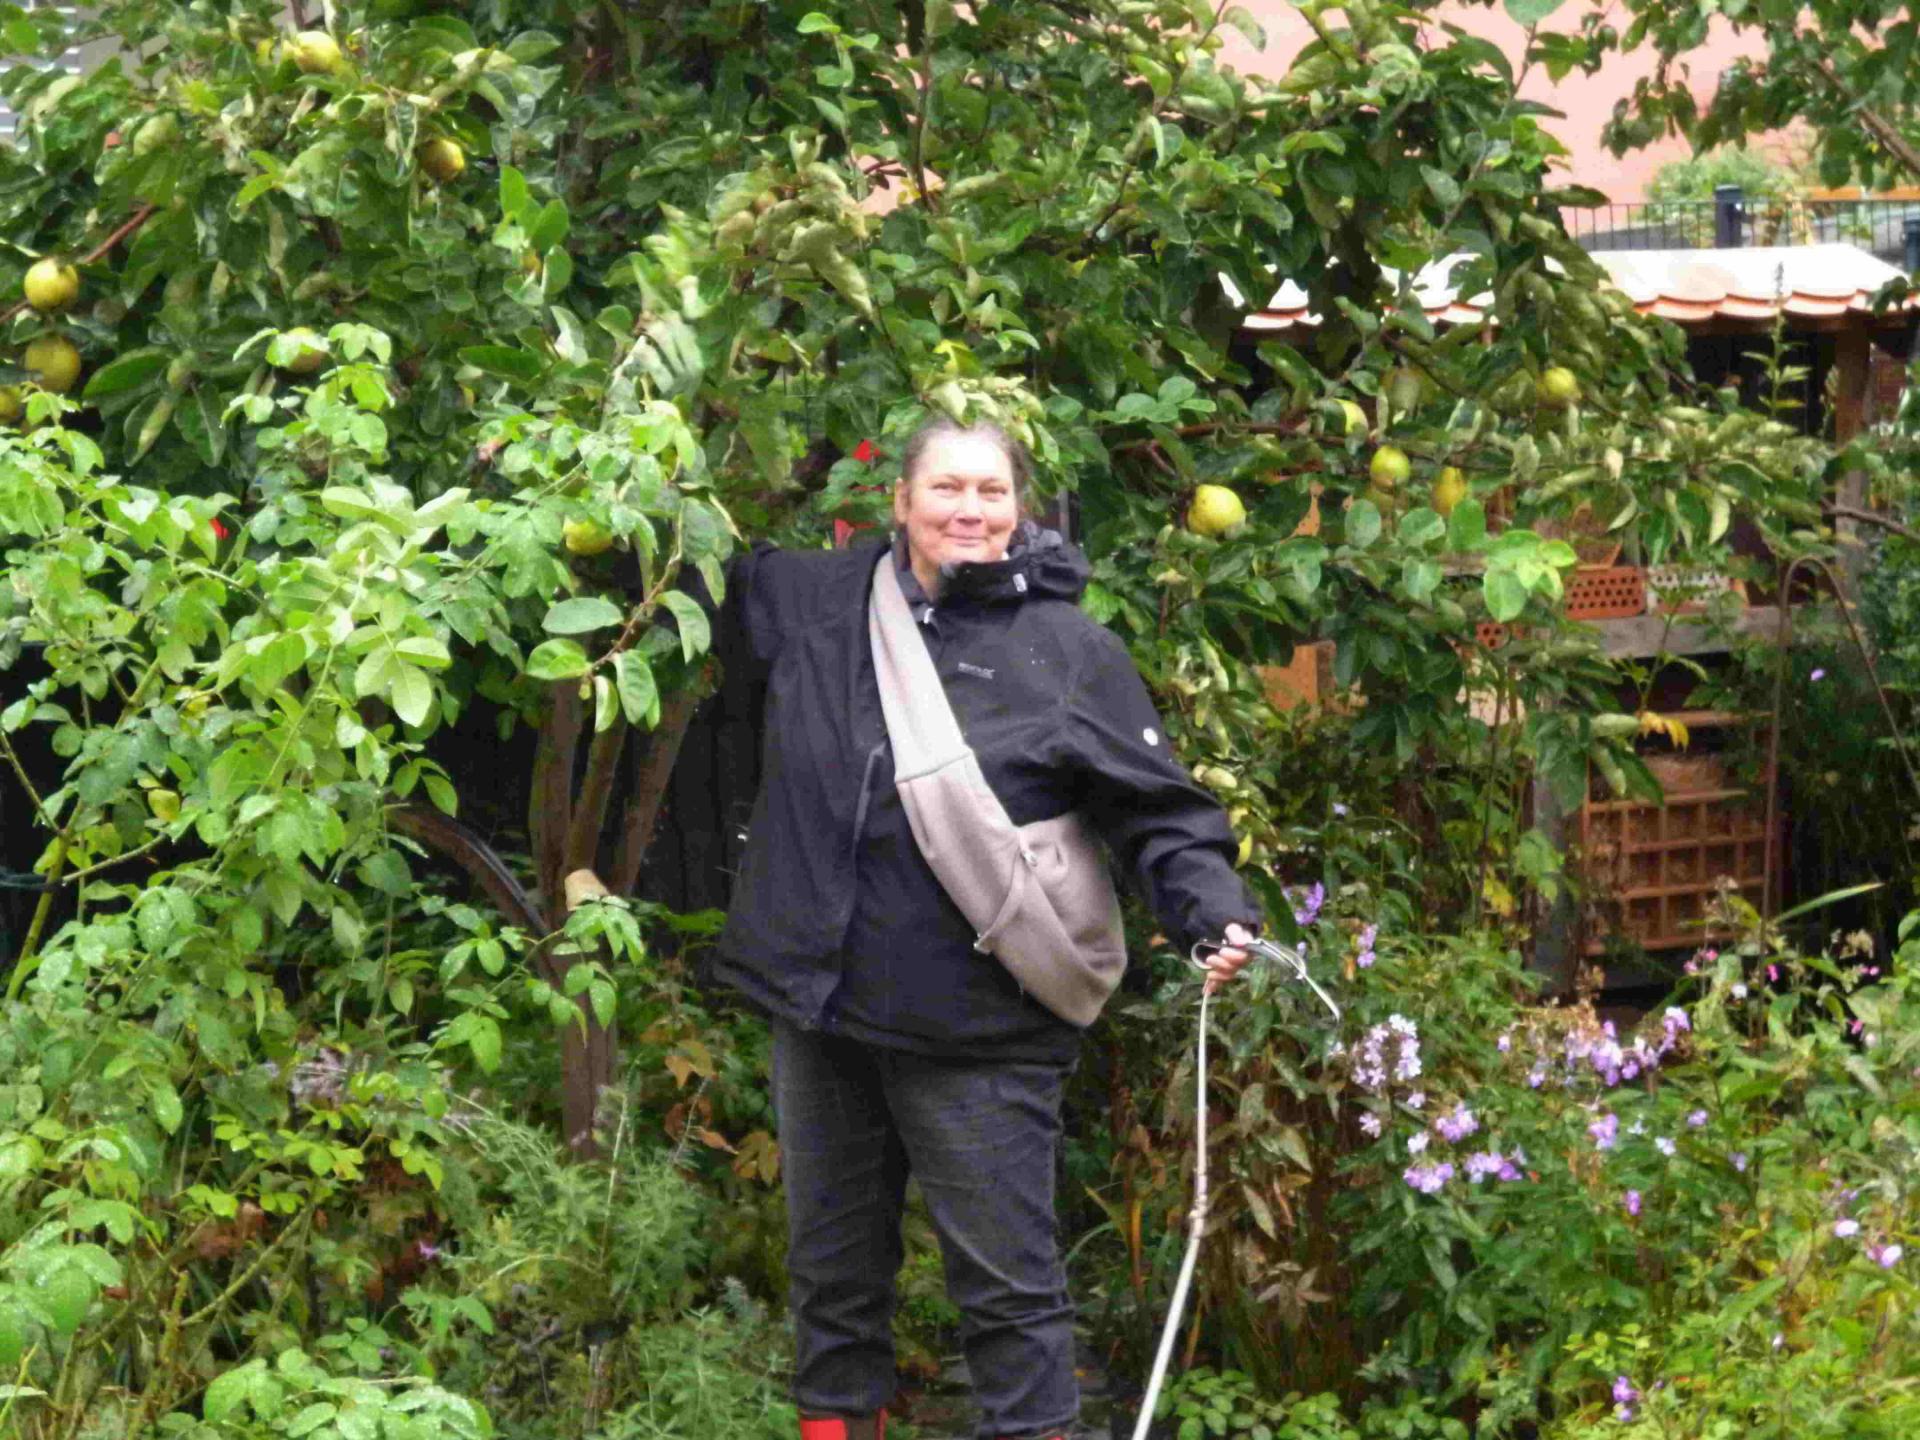 Offene Gartenpfporte 26-09-2020 Bild 16